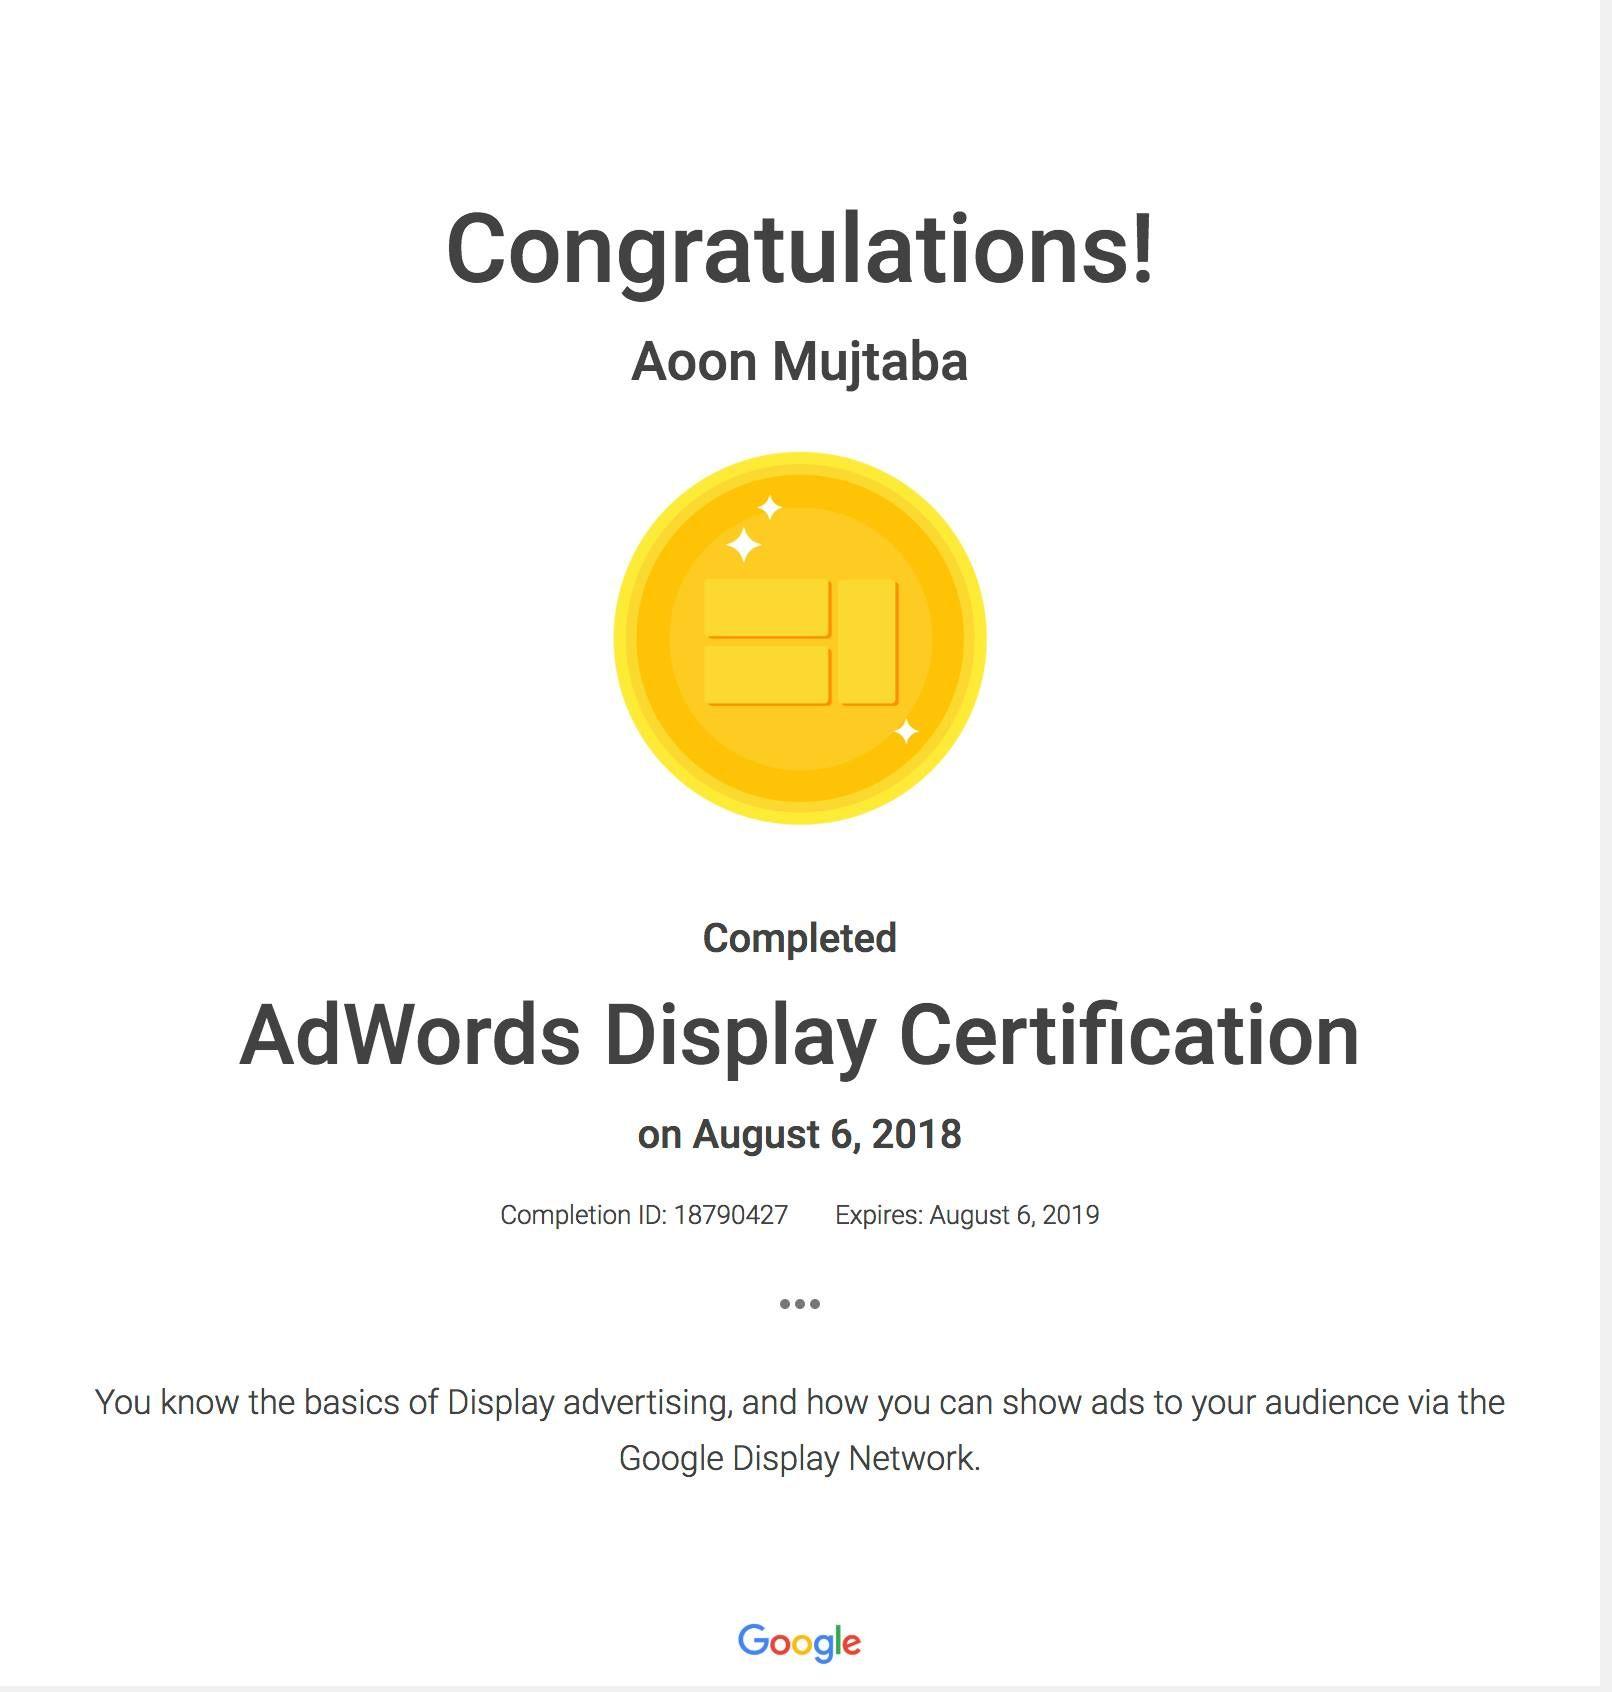 Annual Retake Of Google: AdWords Display Certification